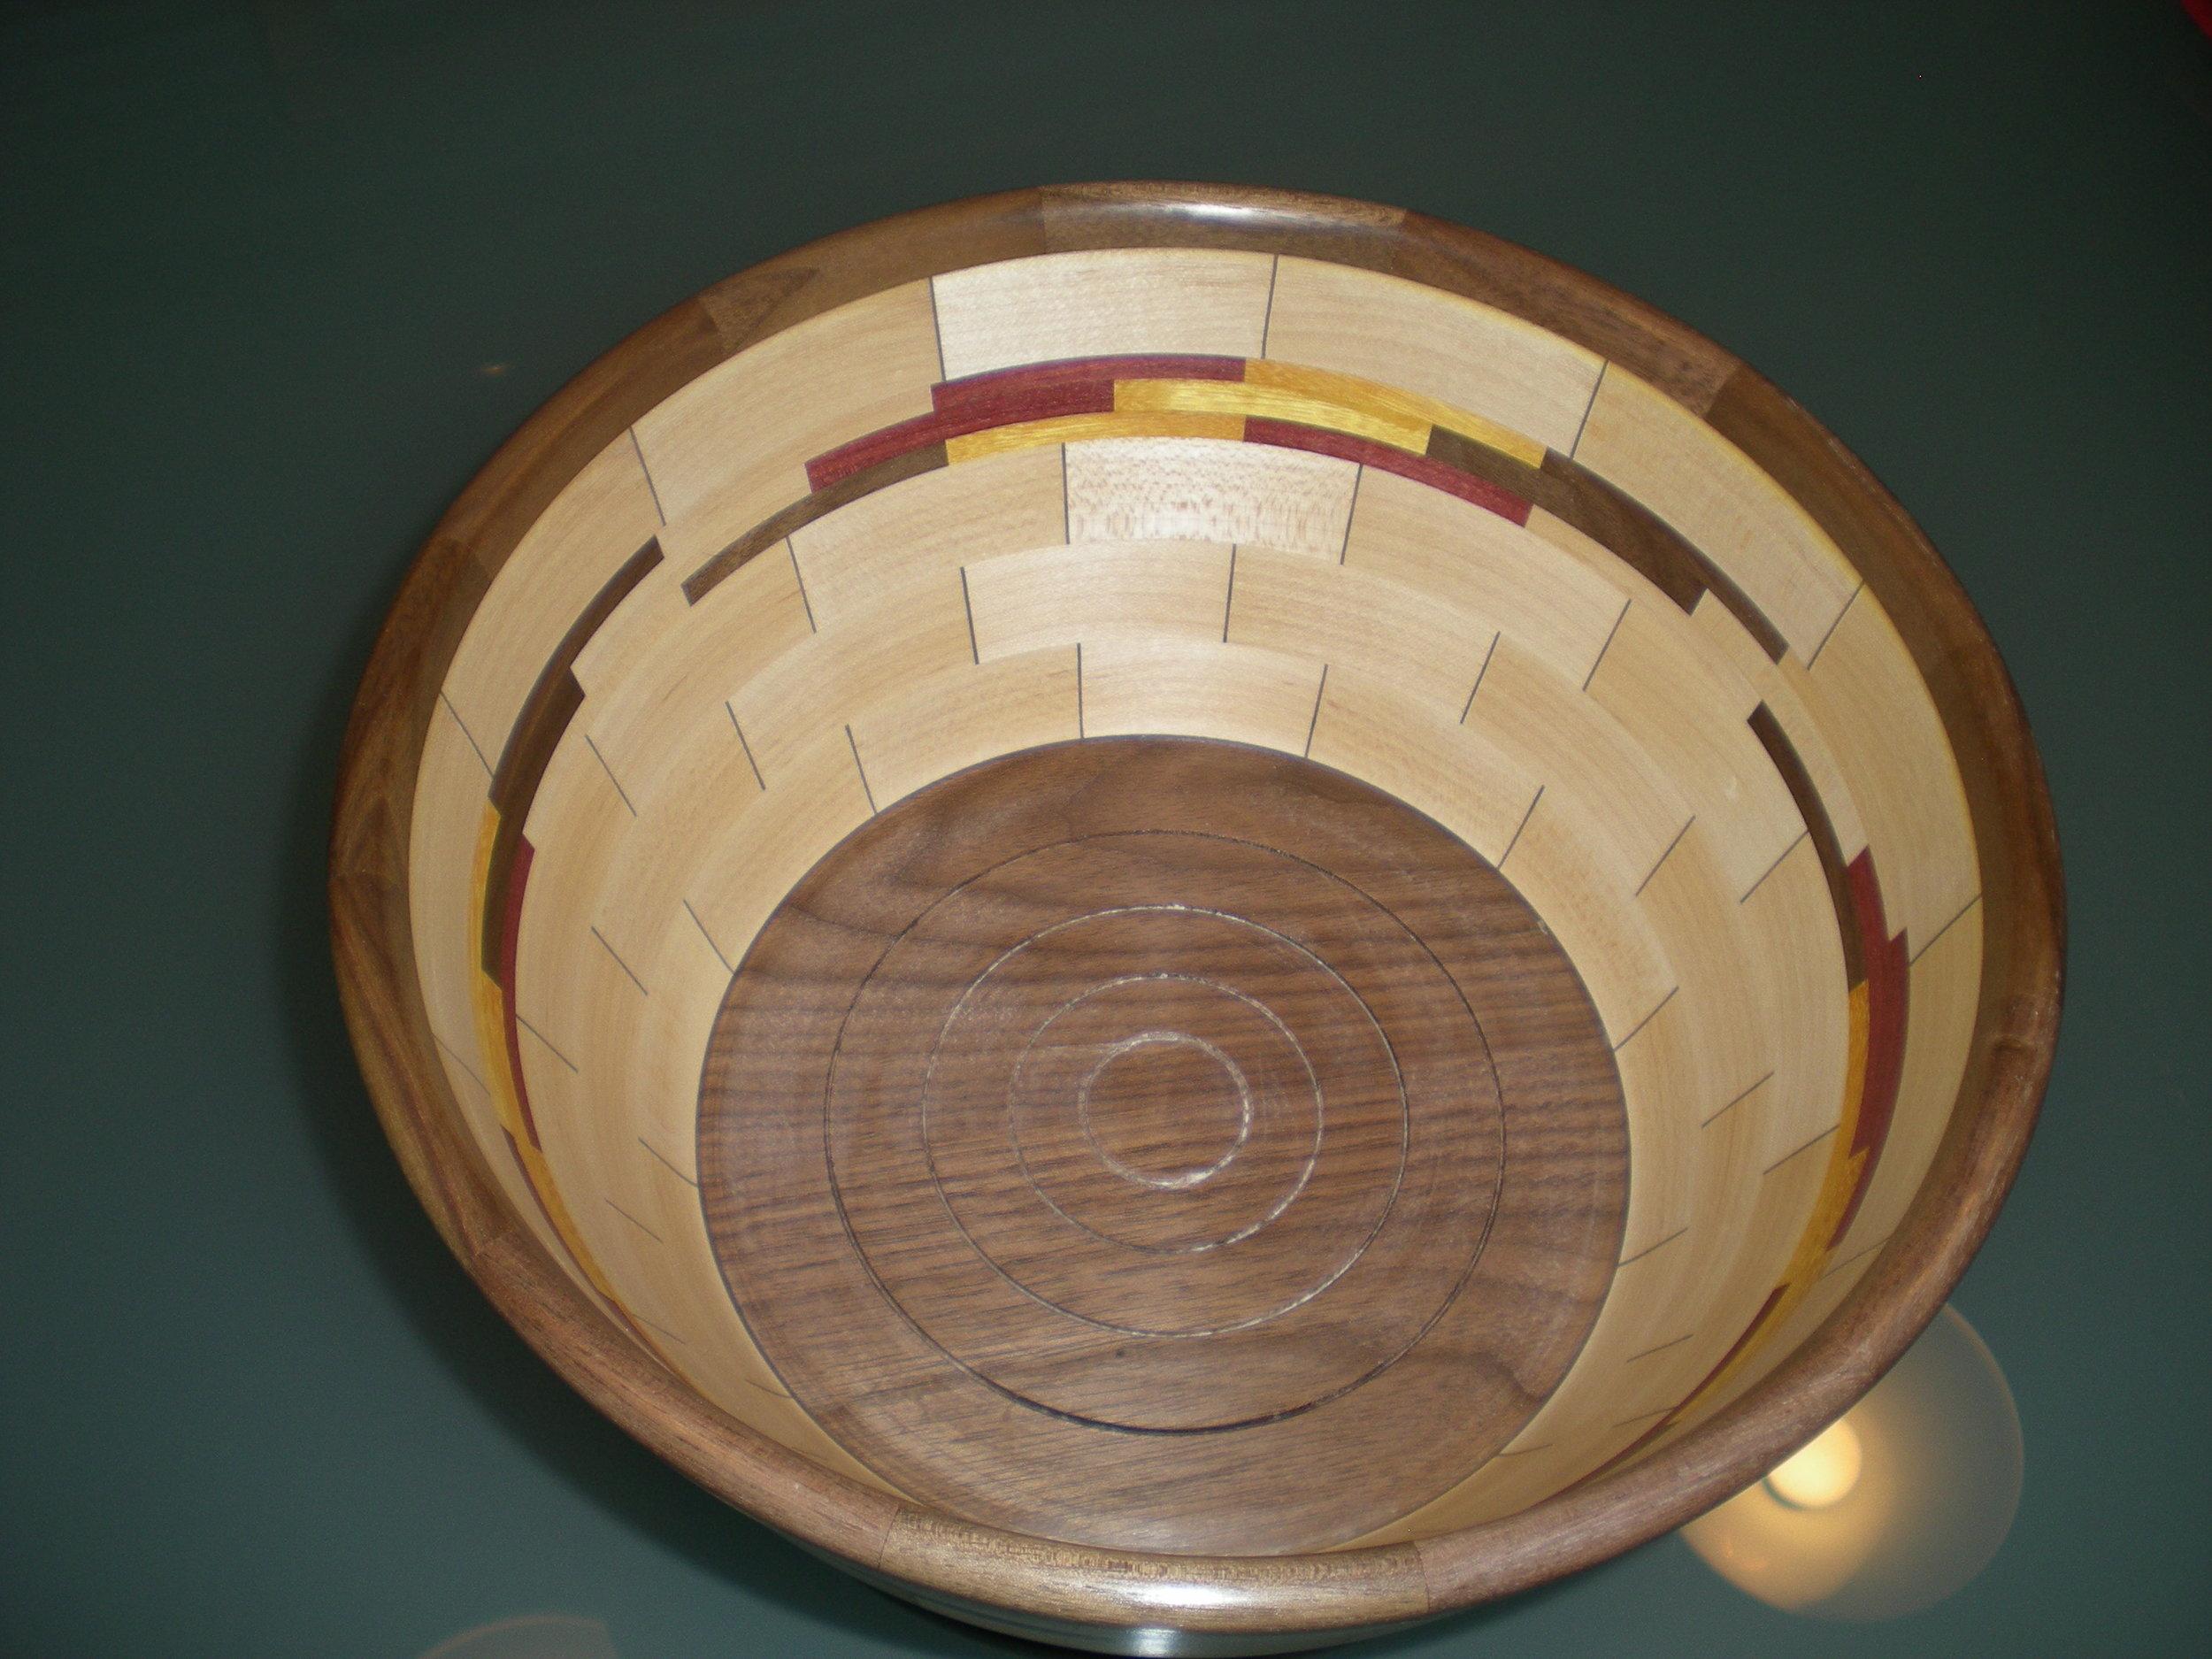 RJC Wood Creations - Bowls (9).JPG